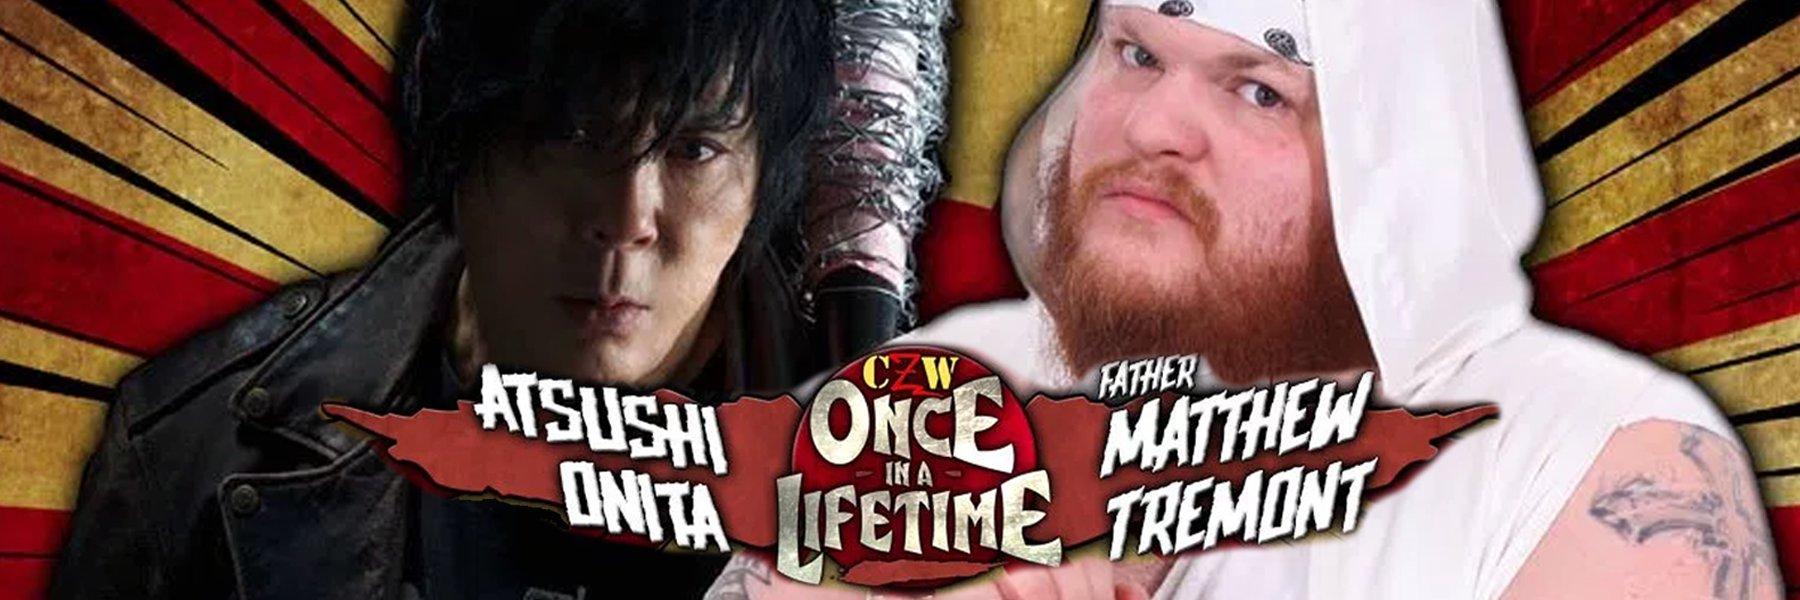 Deathmatch legends Onita & Matt Tremont collide in CZW's Once in a Lifetime